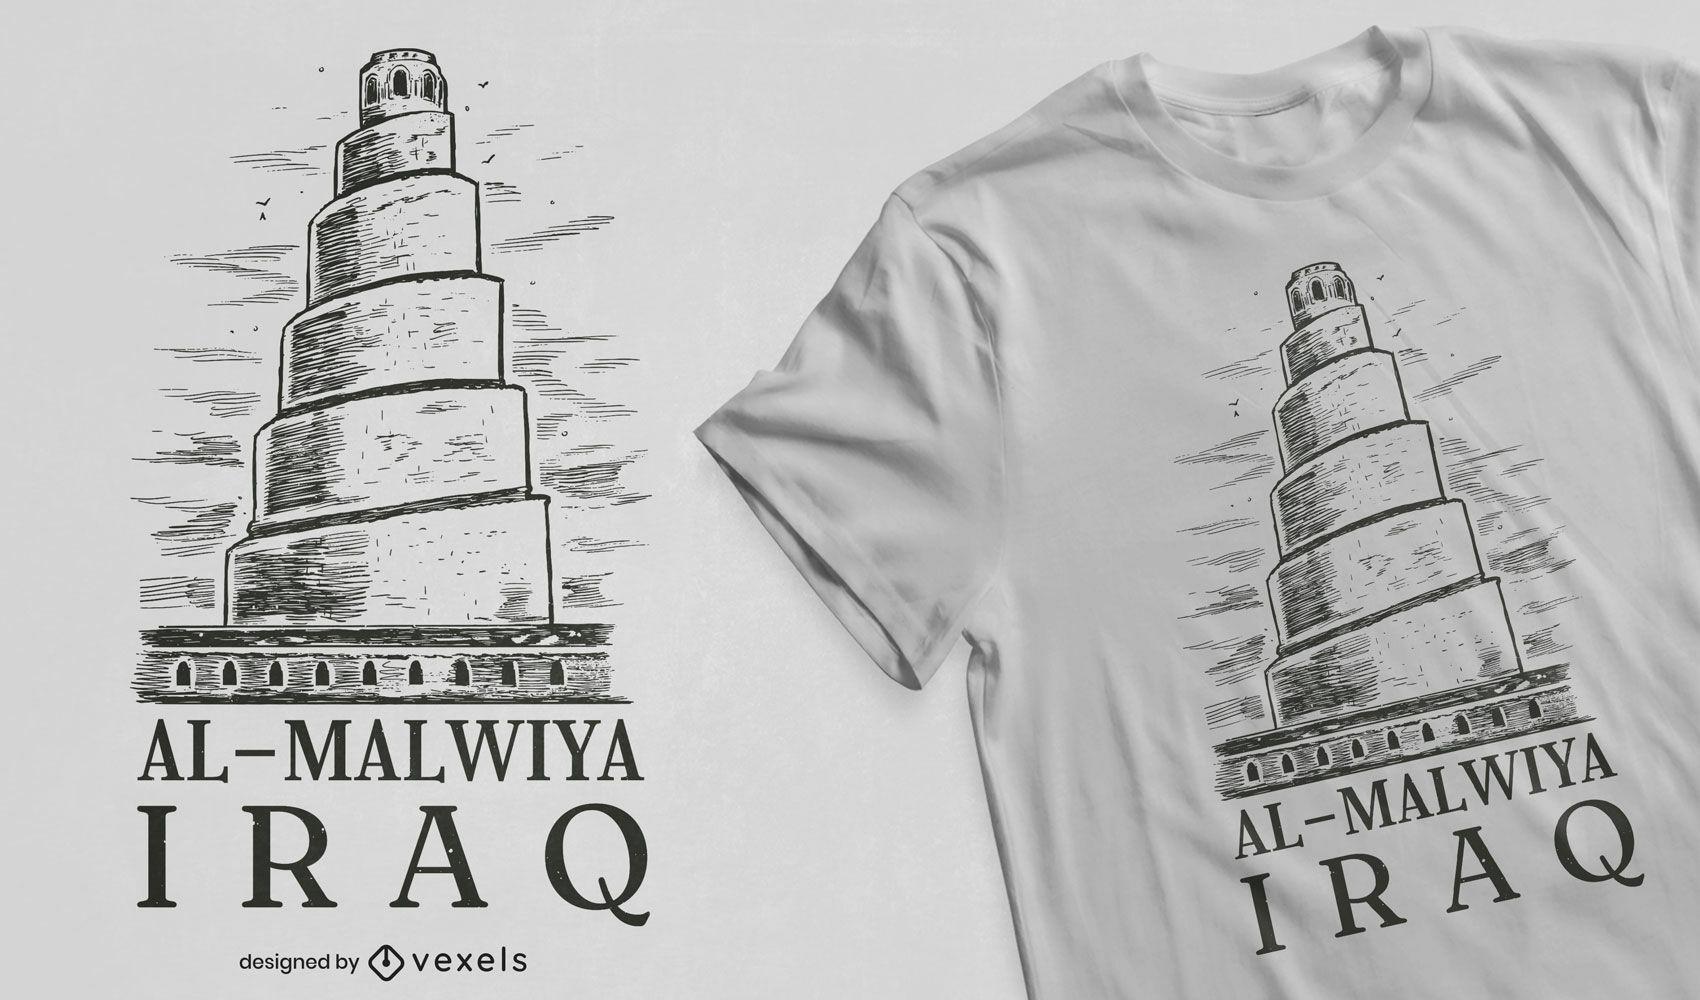 Al-malwiya Iraq mosque t-shirt design